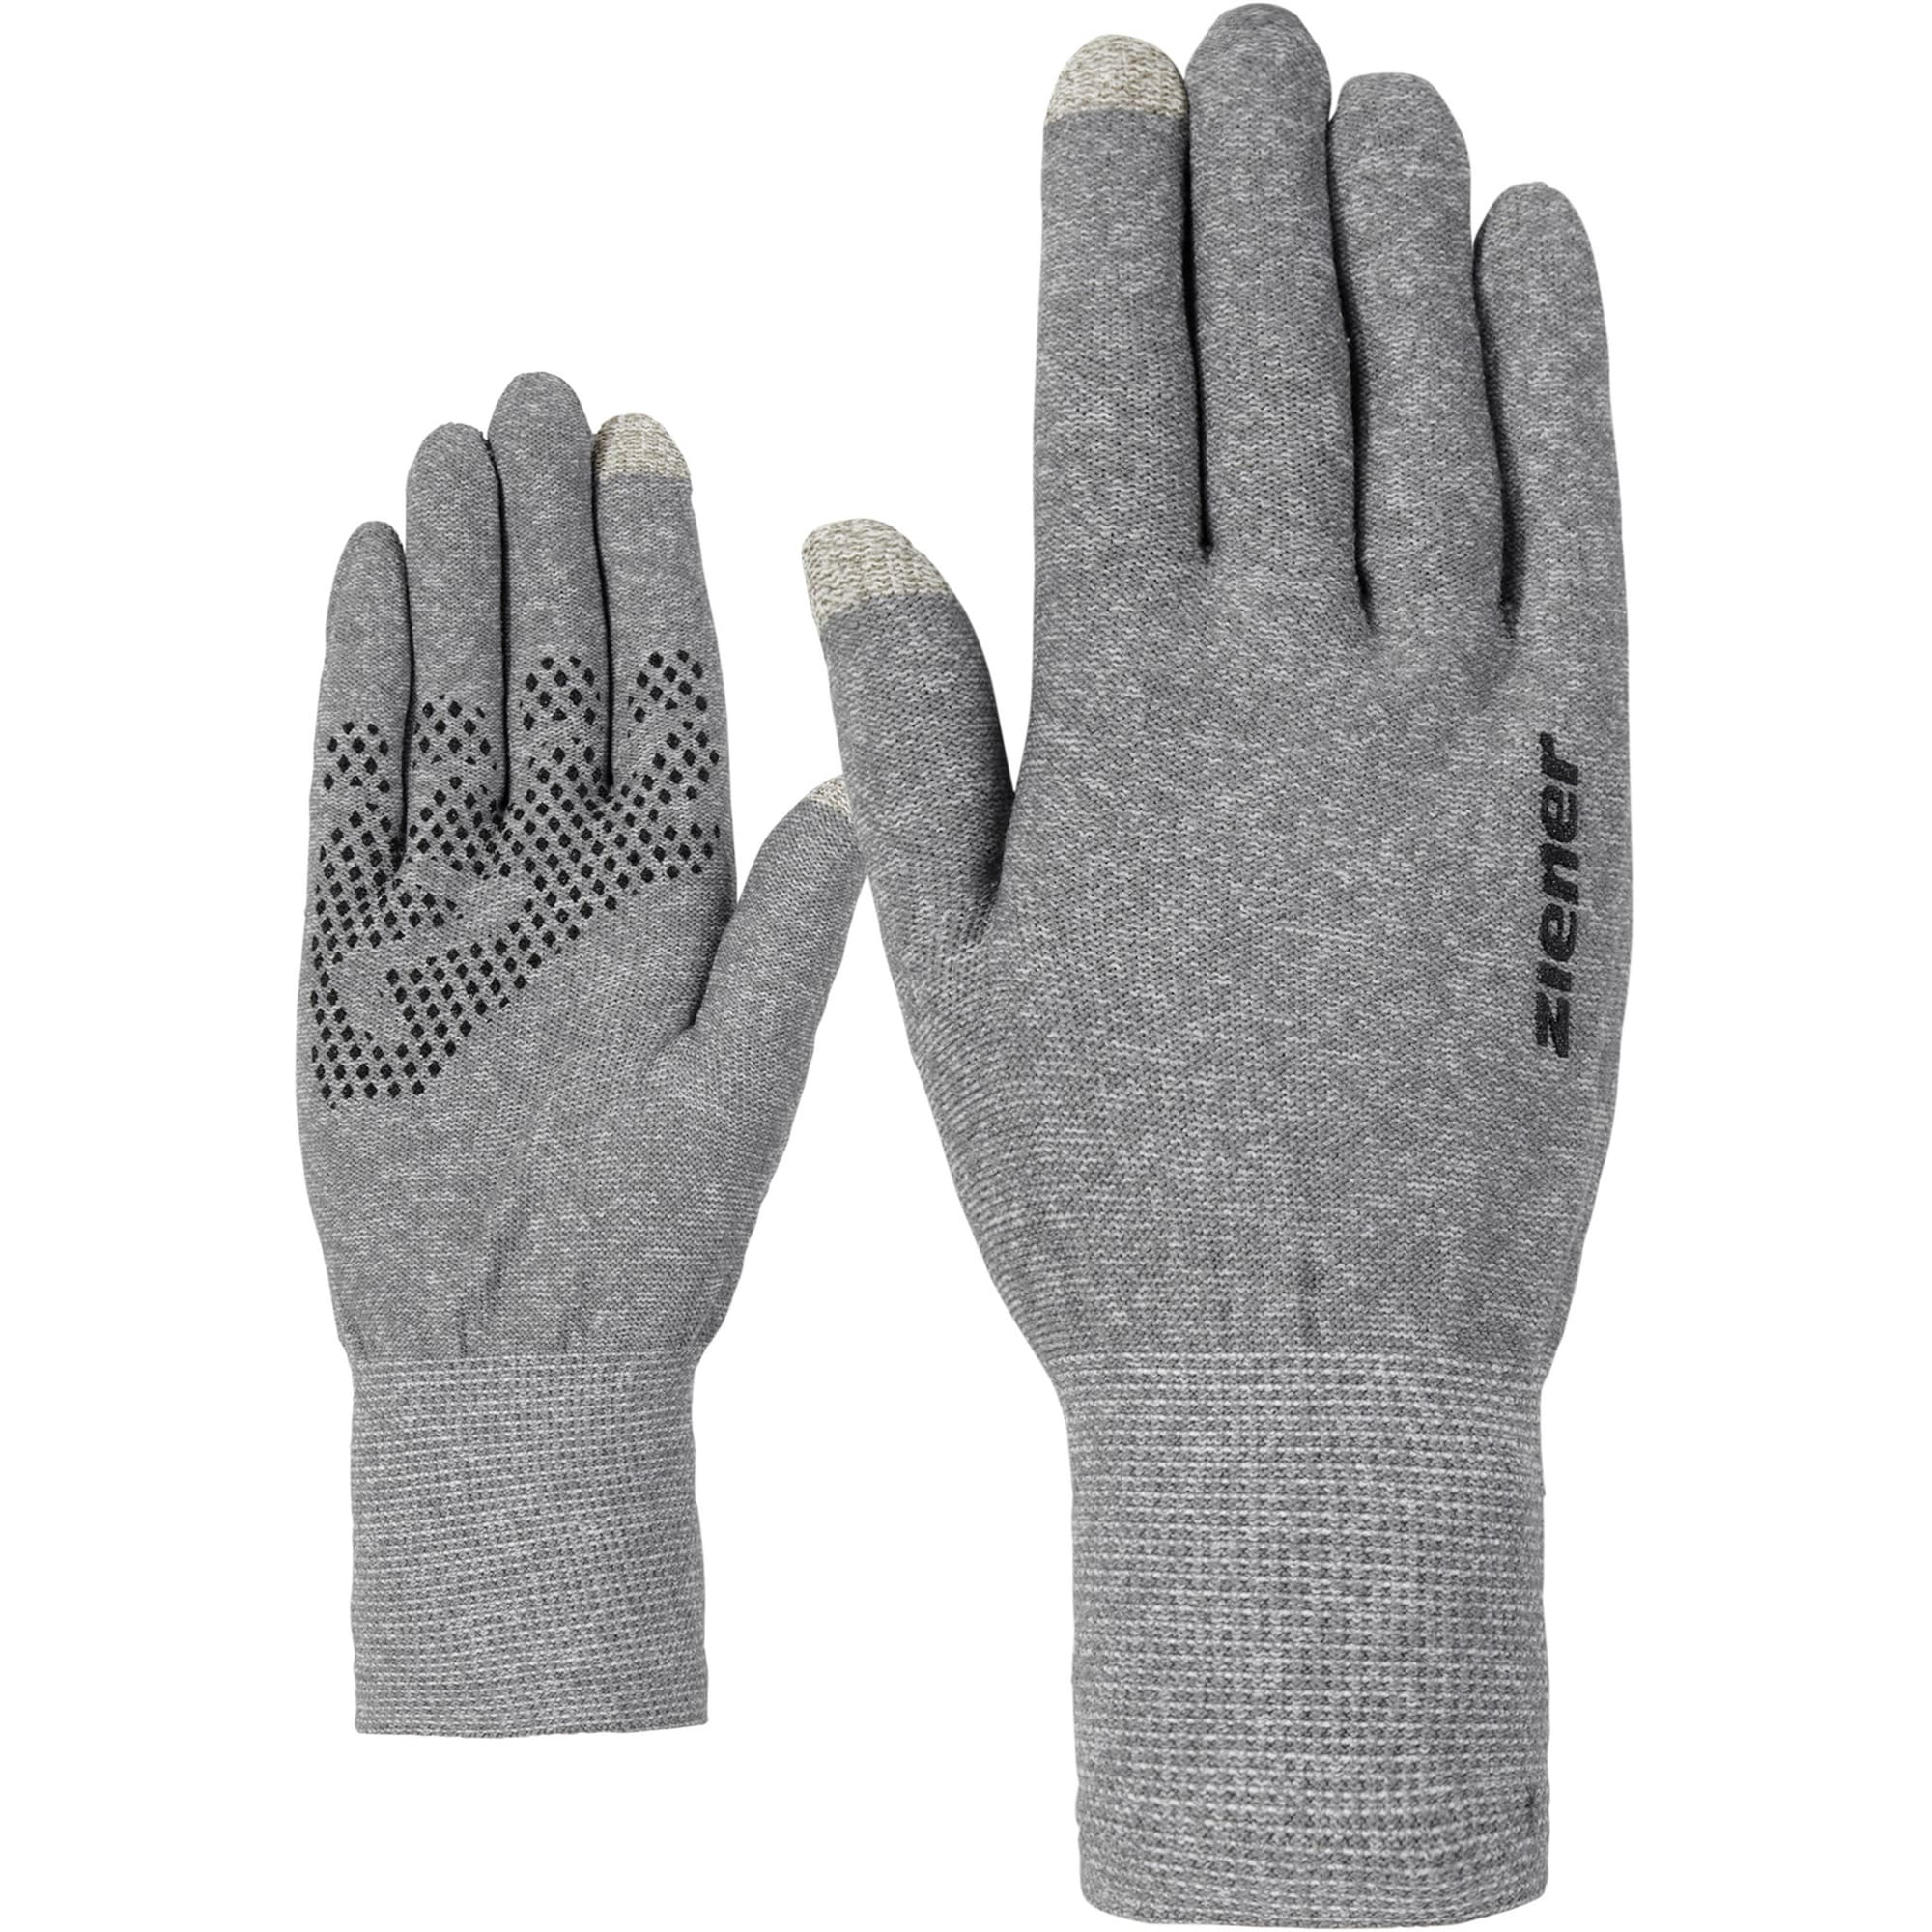 Fingerhandschuhe 'Ibico Touch Glove Multisport' | Accessoires > Handschuhe | ZIENER